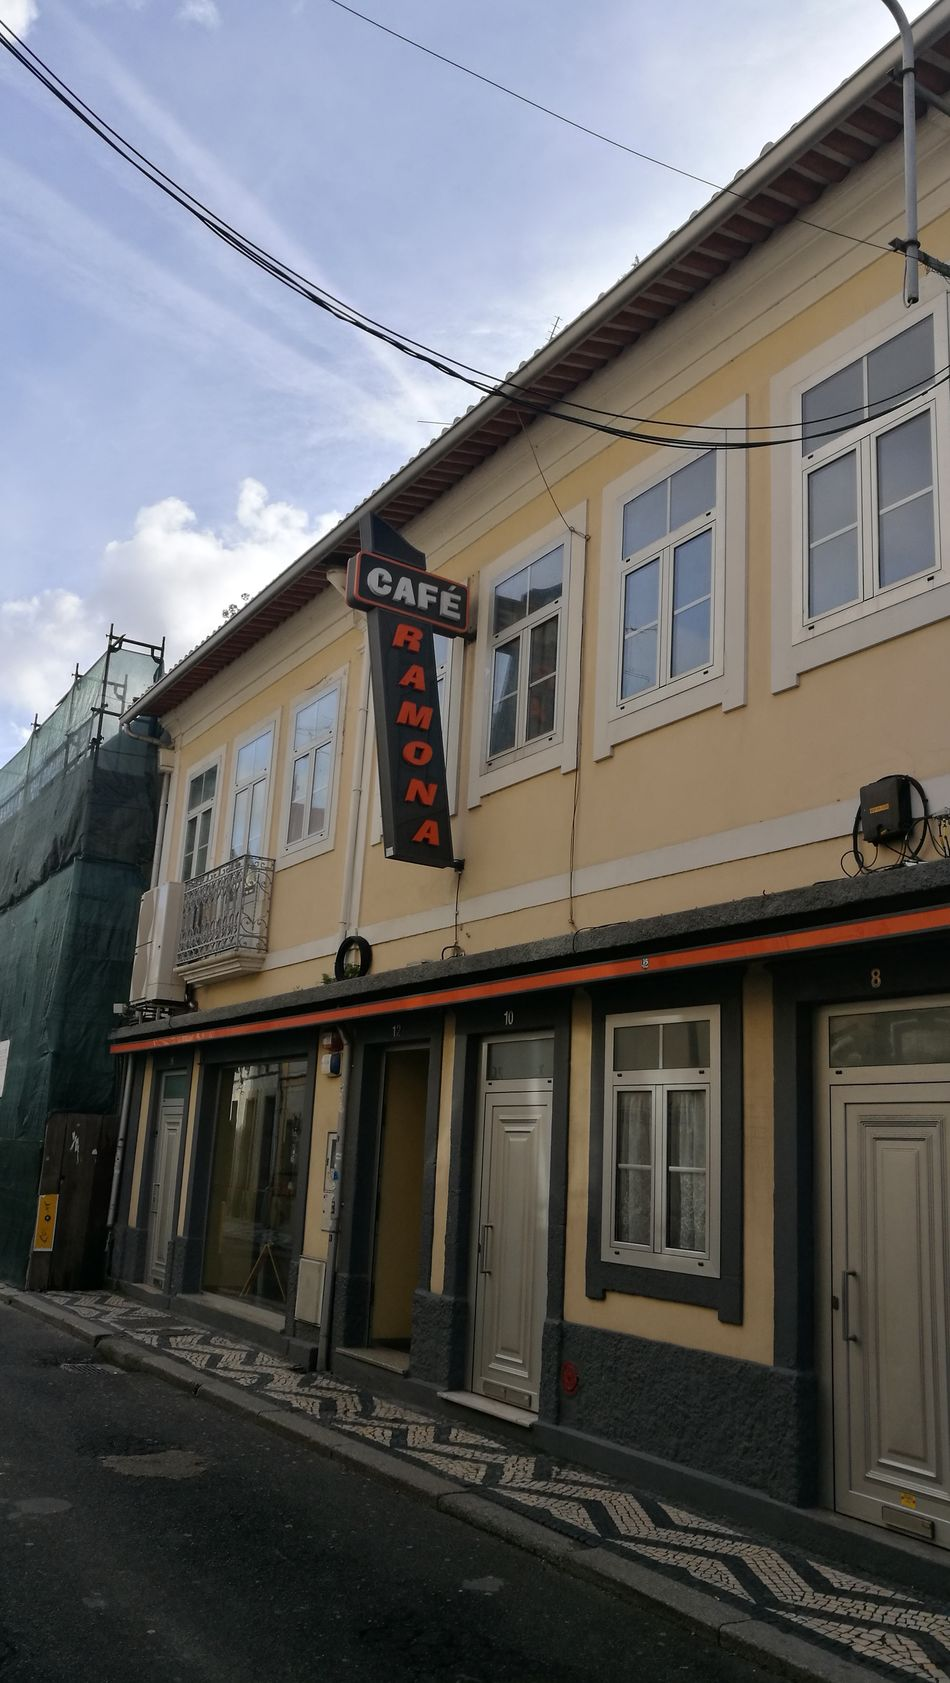 Cafe Ramona Ramona, Aveiro Structure City Street Aveiro Aveiro, Portugal Outdoors Travel Destinations Hamburger Steak Hamburger🍔🍟